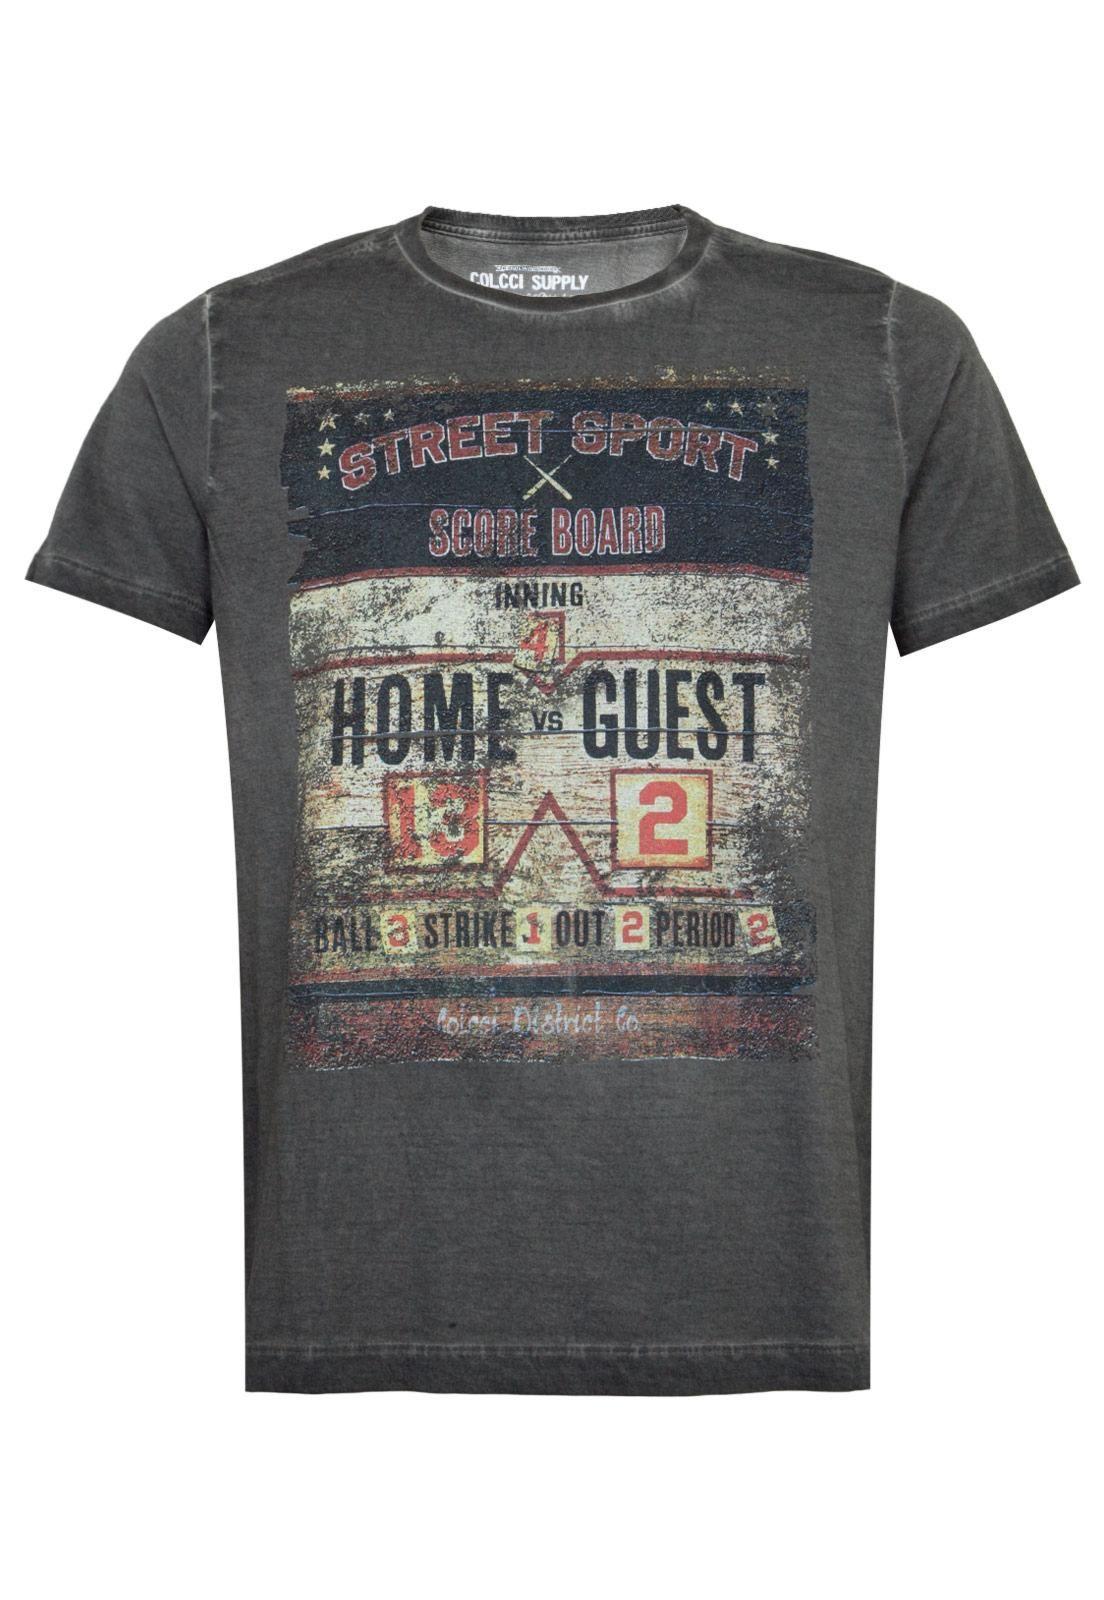 2818a4051 Colcci Colcci Masculino, Jeans Feminino, Camisetas Evangelicas, Estampa  Masculina, Camisetas Masculinas,